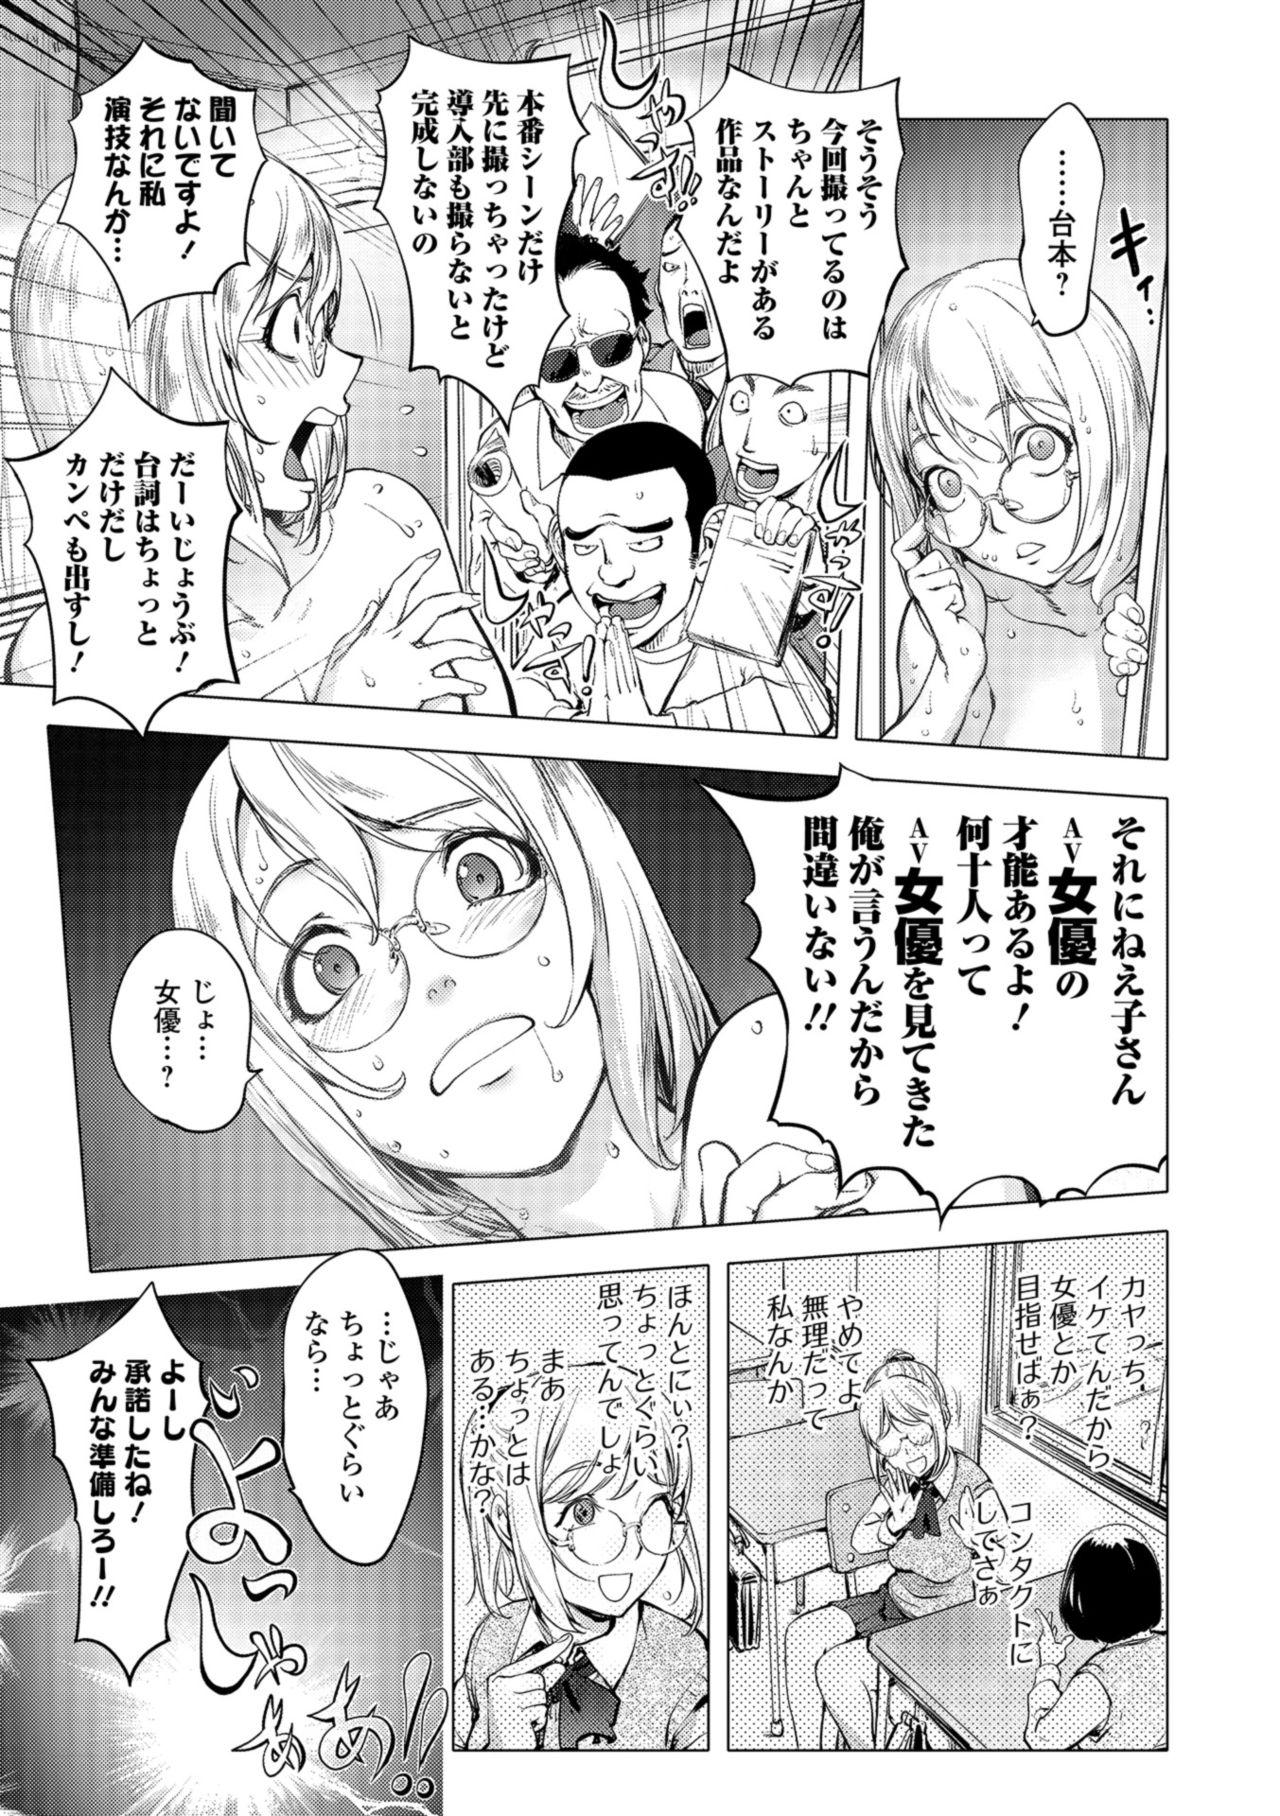 COMIC Shigekiteki SQUIRT!! Vol. 09 60